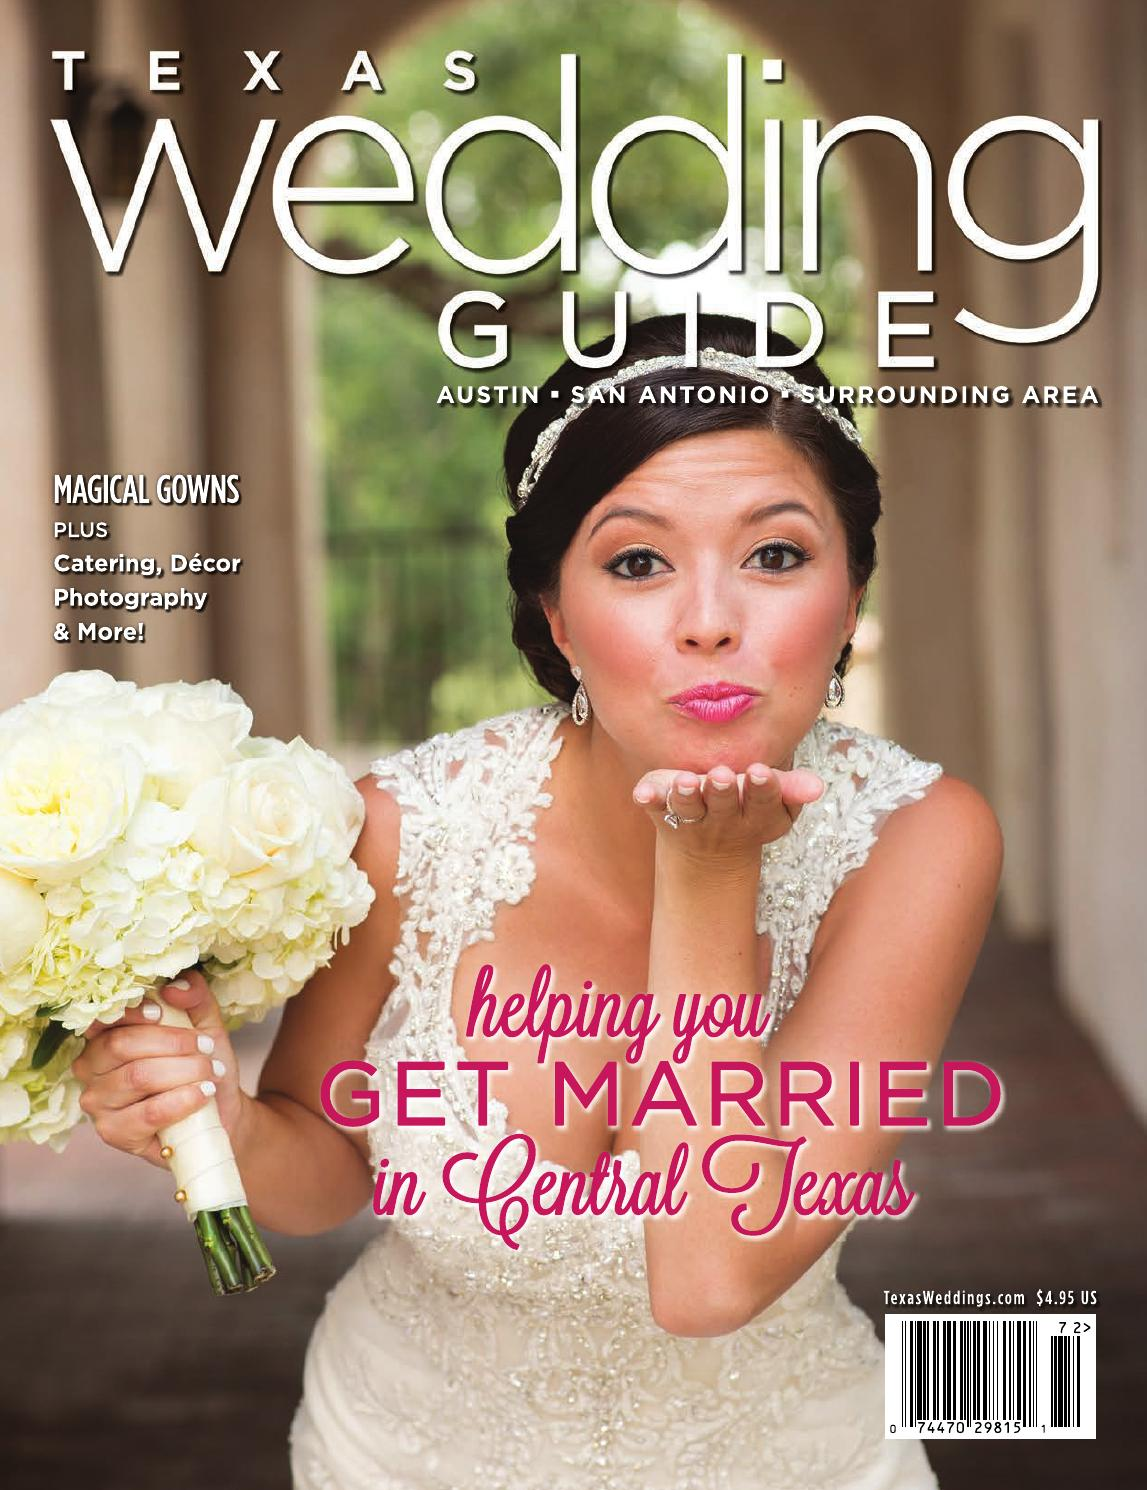 Texas Wedding Guide Summer 2017 By Texas Wedding Guide Issuu